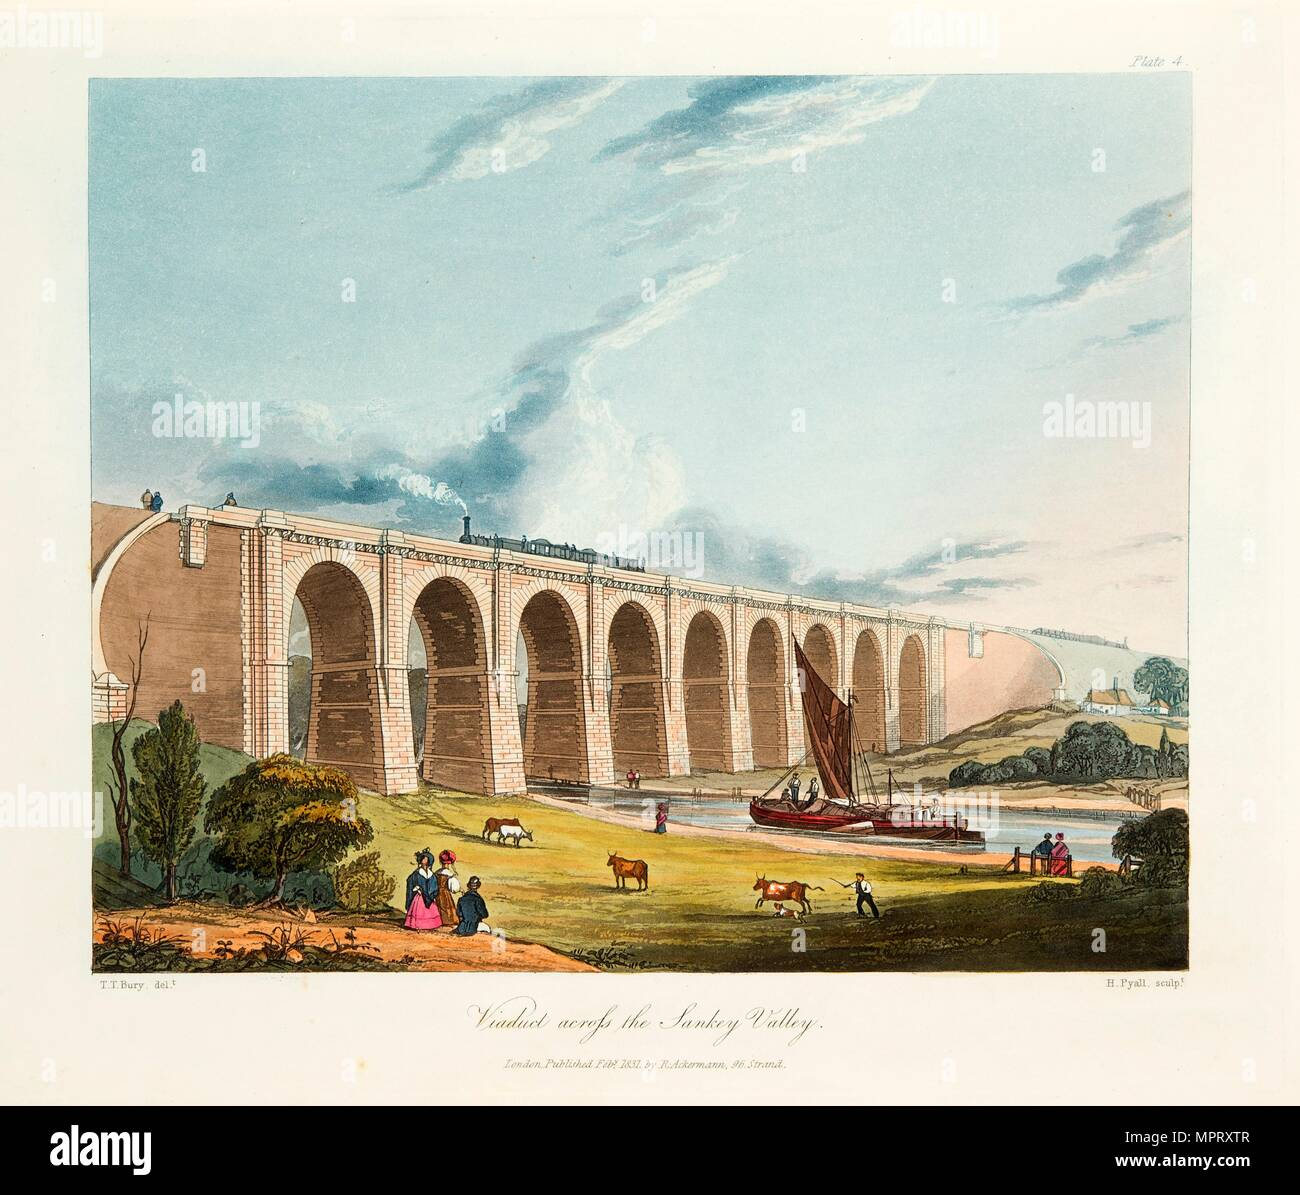 Viaduct across the Sankey Valley, Warrington, Cheshire, February 1831.  Artist: Thomas Talbot Bury. Stock Photo